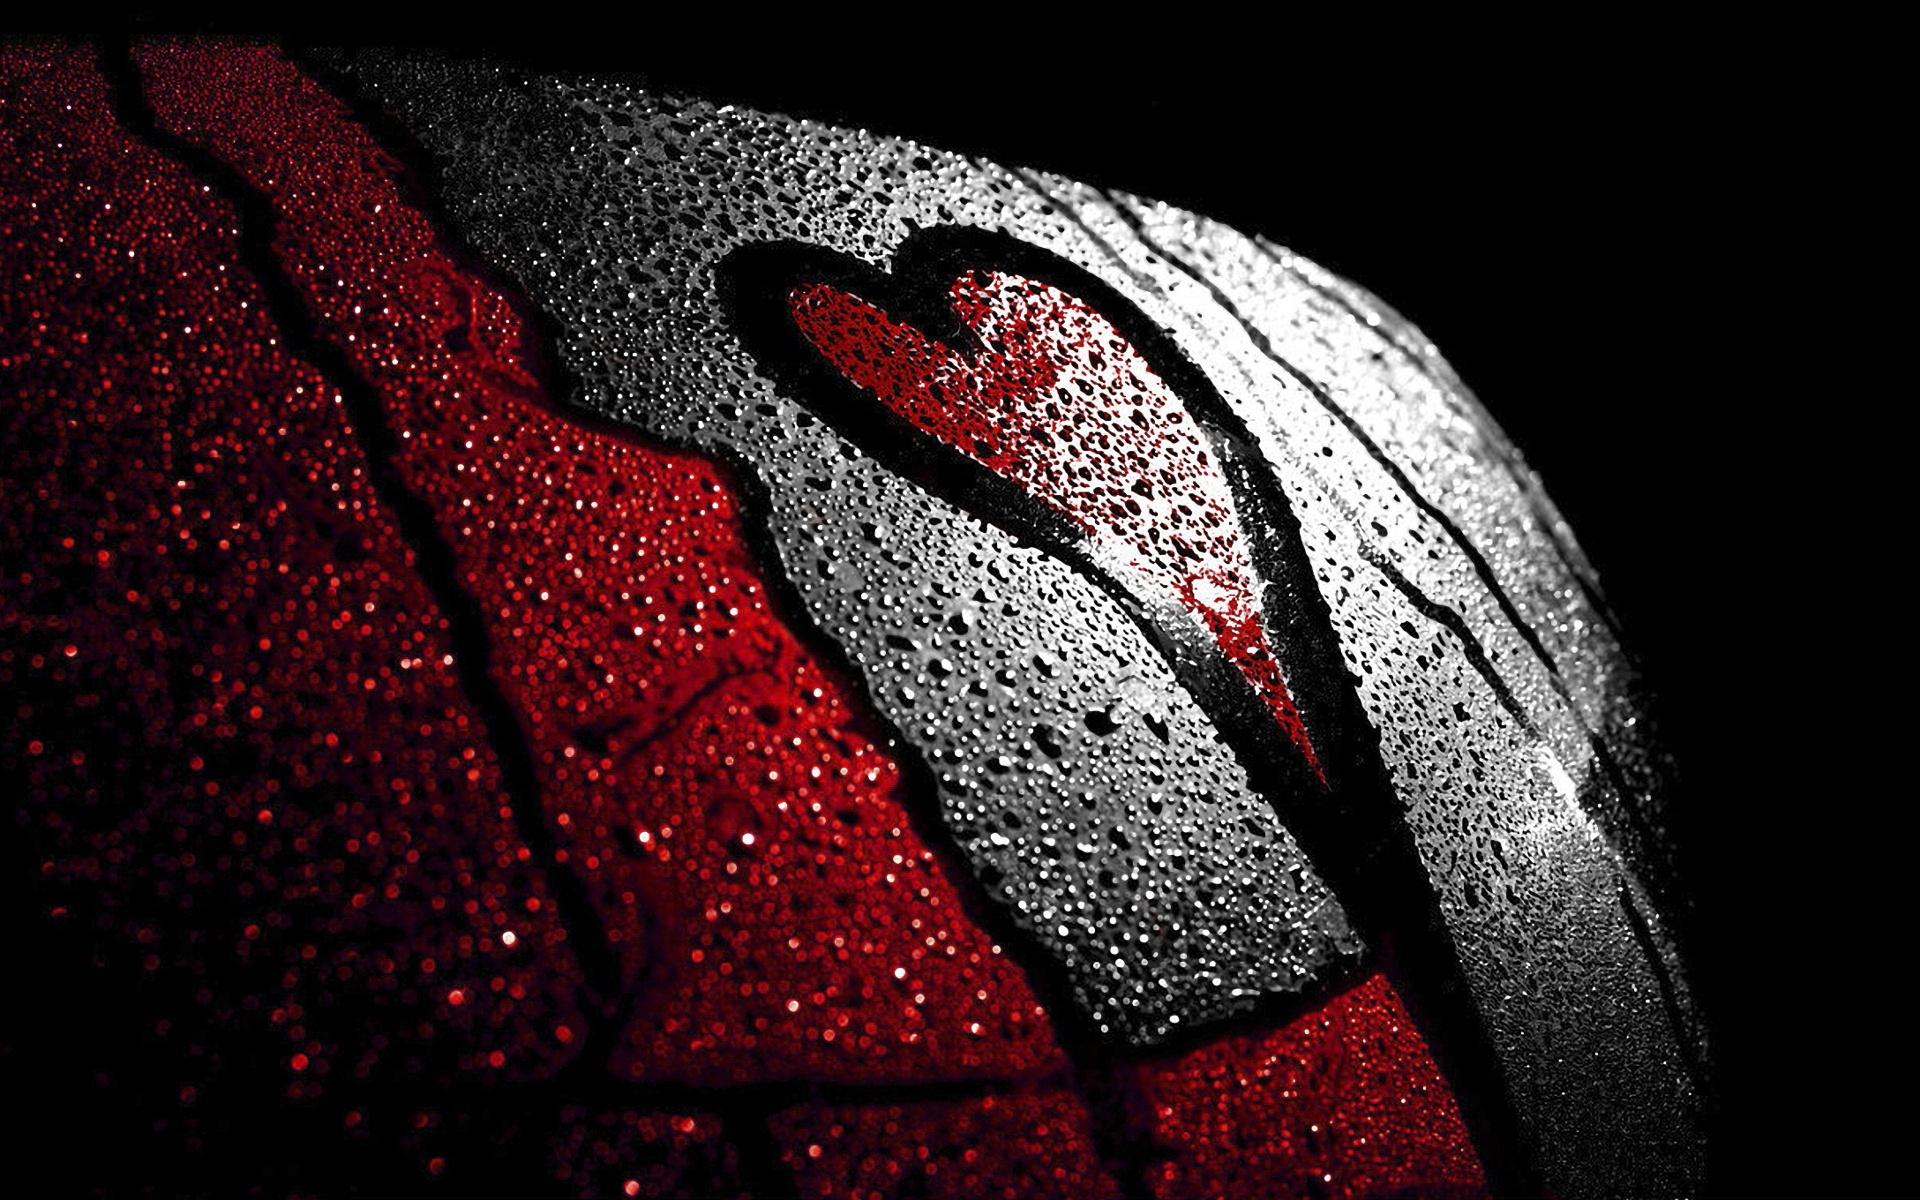 Wallpaper black love heart red darkness graphics - Love life wallpaper hd ...